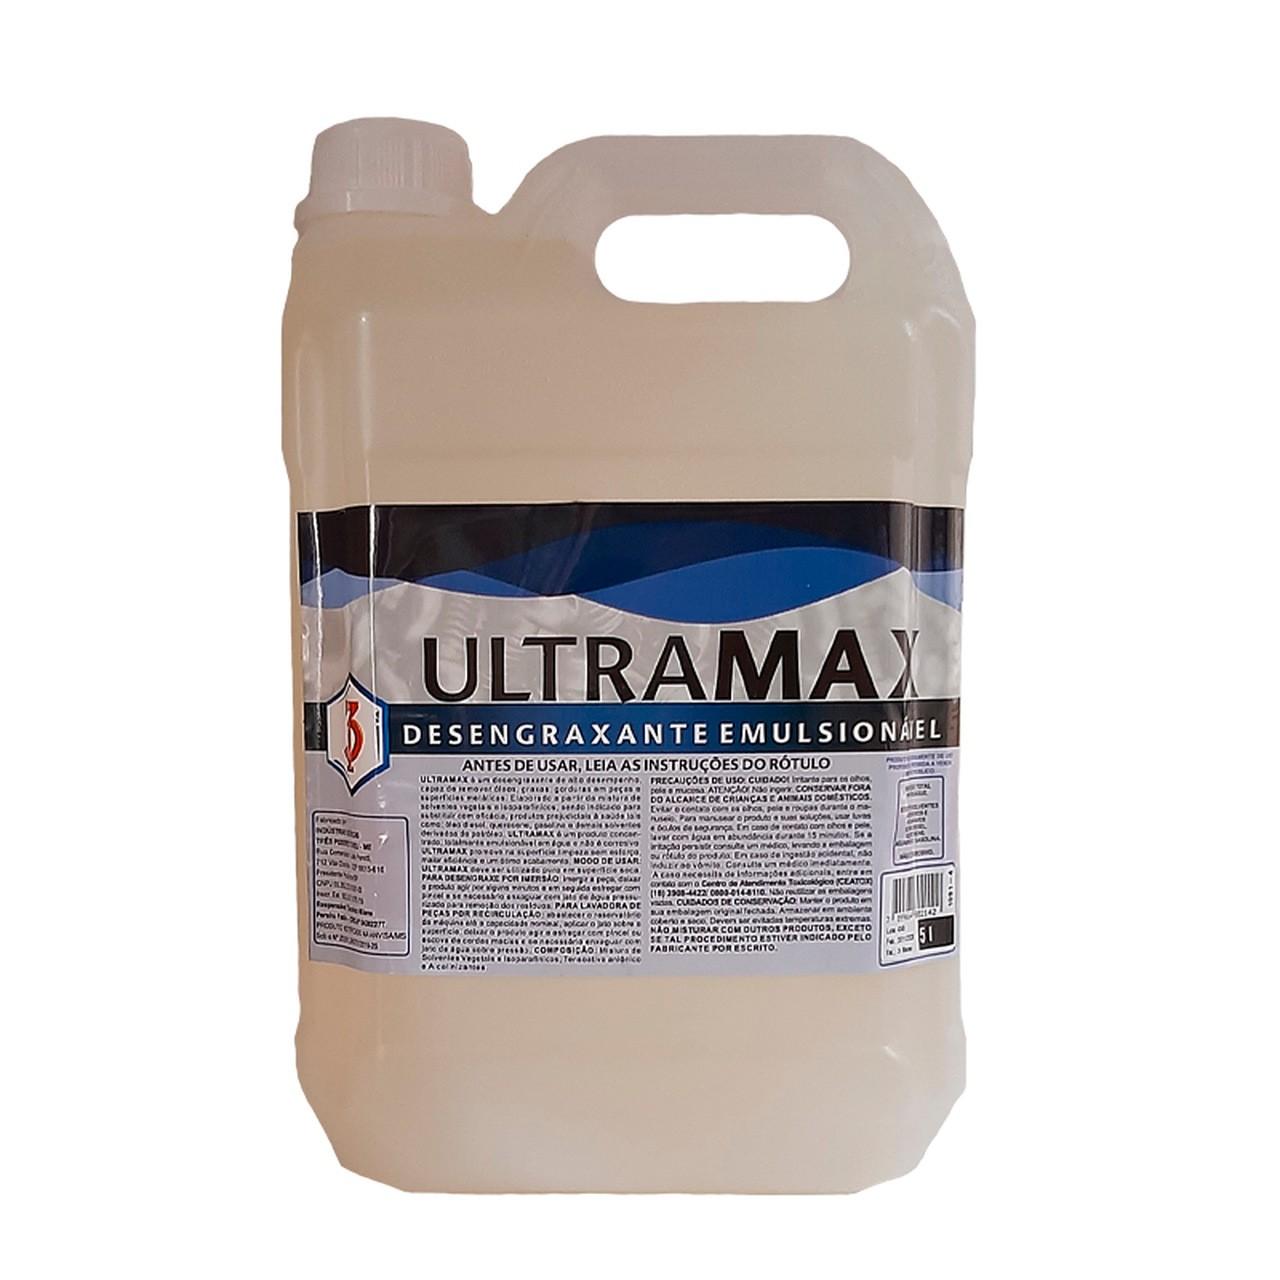 ULTRAMAX 3 Poderes 5LTS - DESENGRAXANTE EMULSIONÁVEL